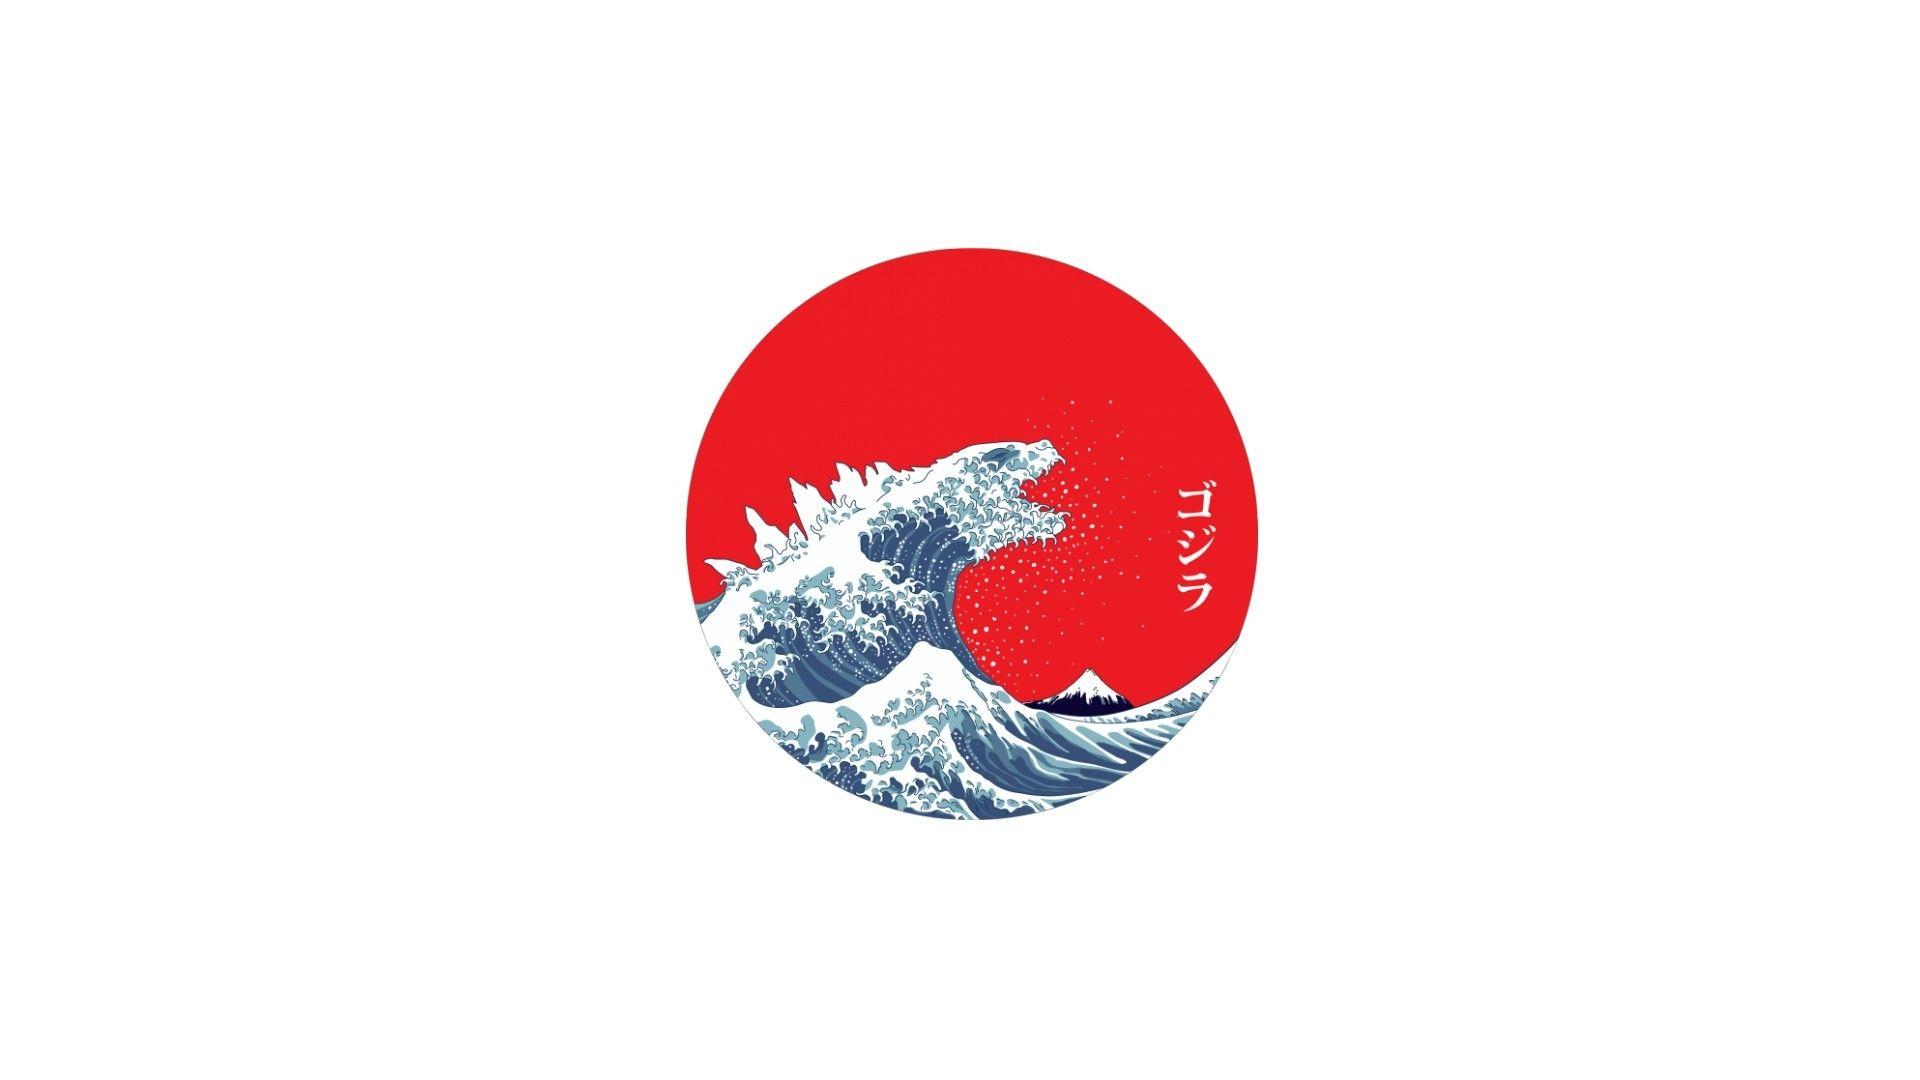 General 1920x1080 Japan The Great Wave Off Kanagawa Waves Minimalism